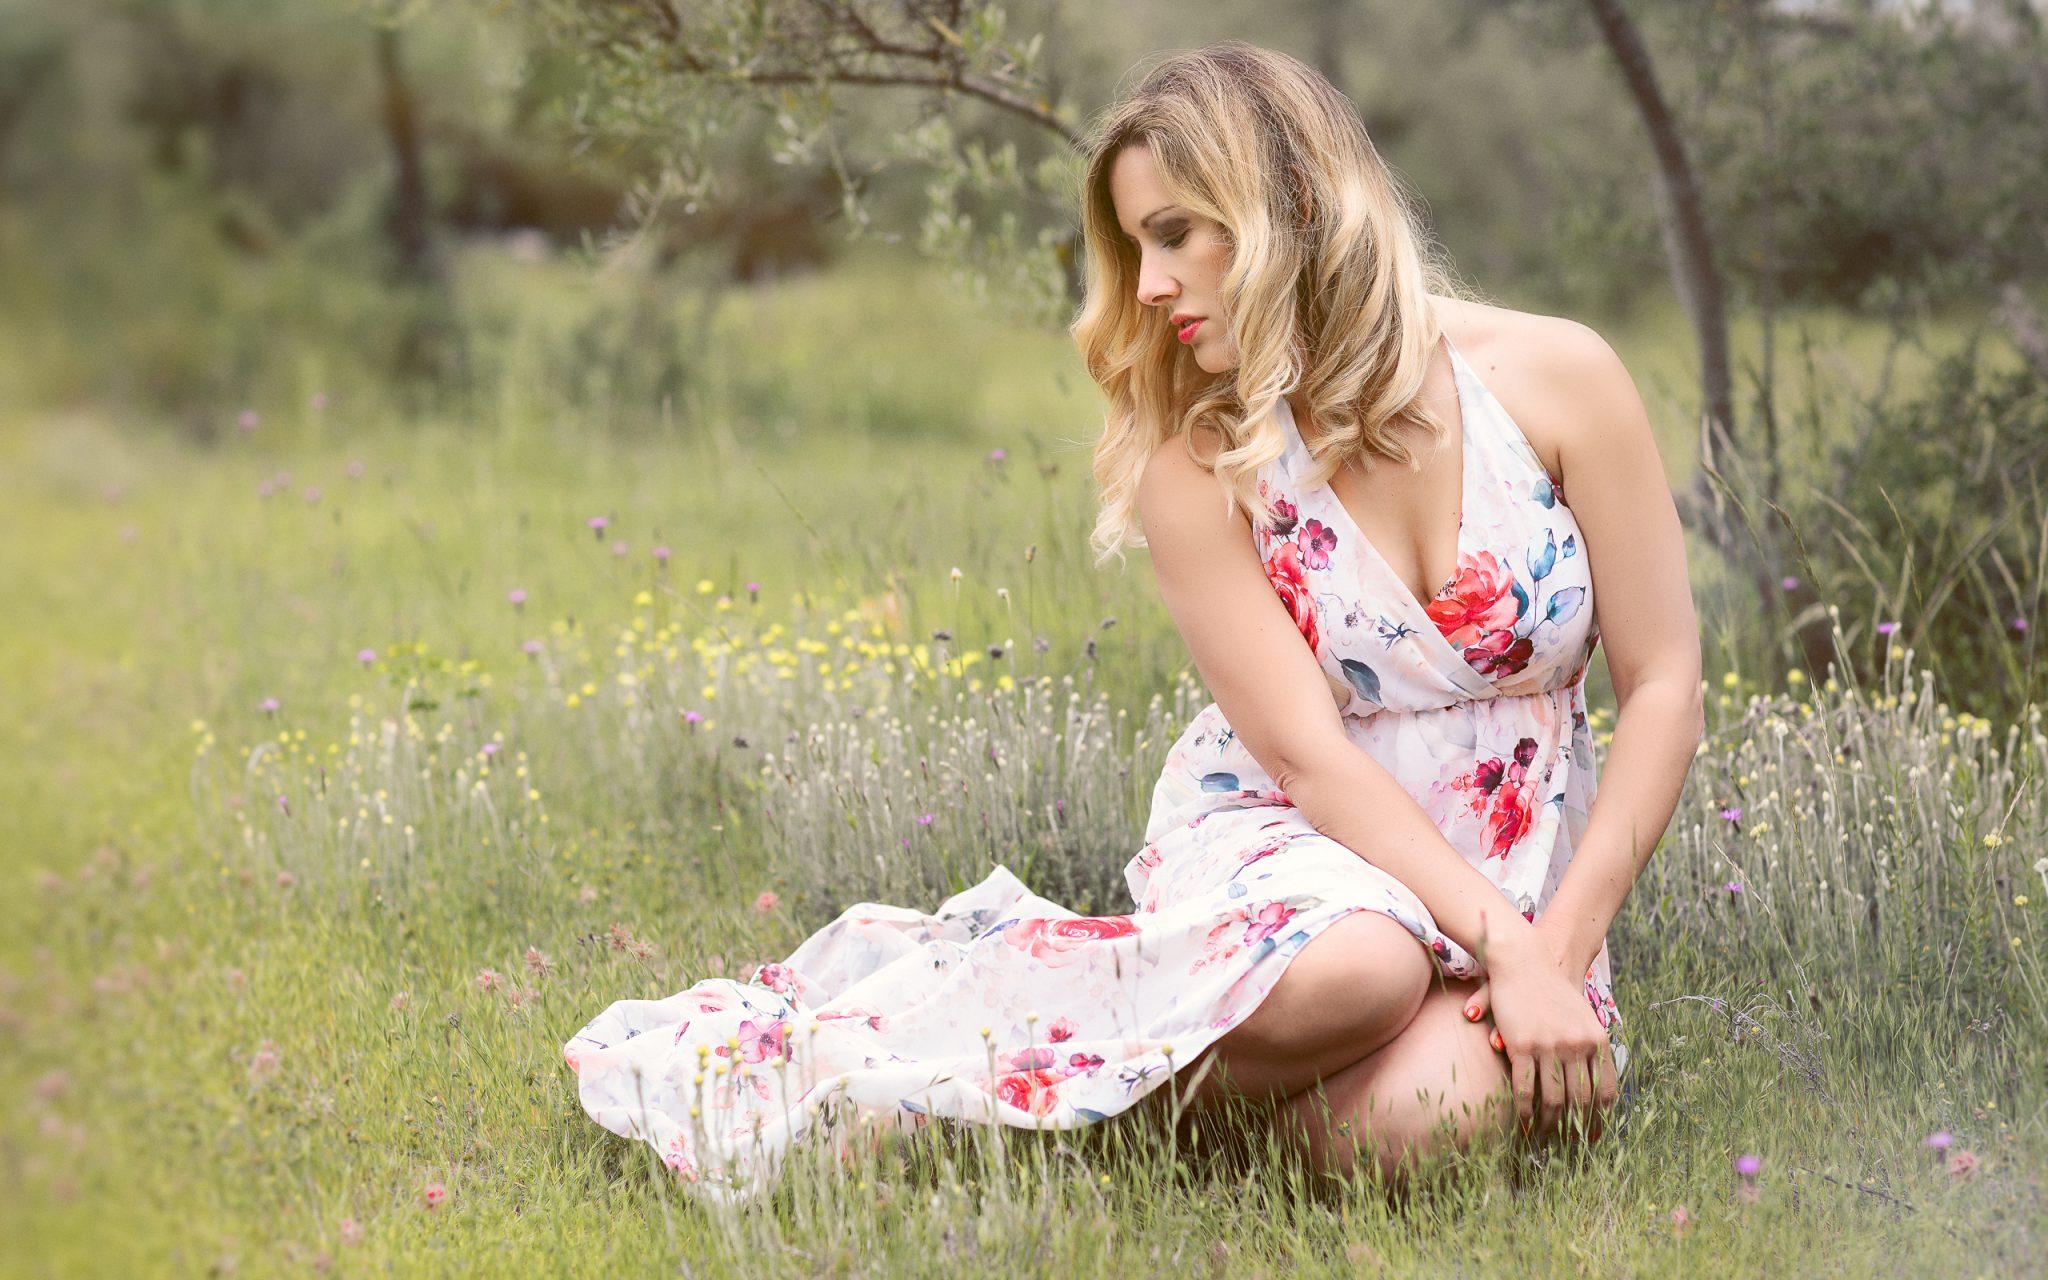 belle femme dans les oliviers